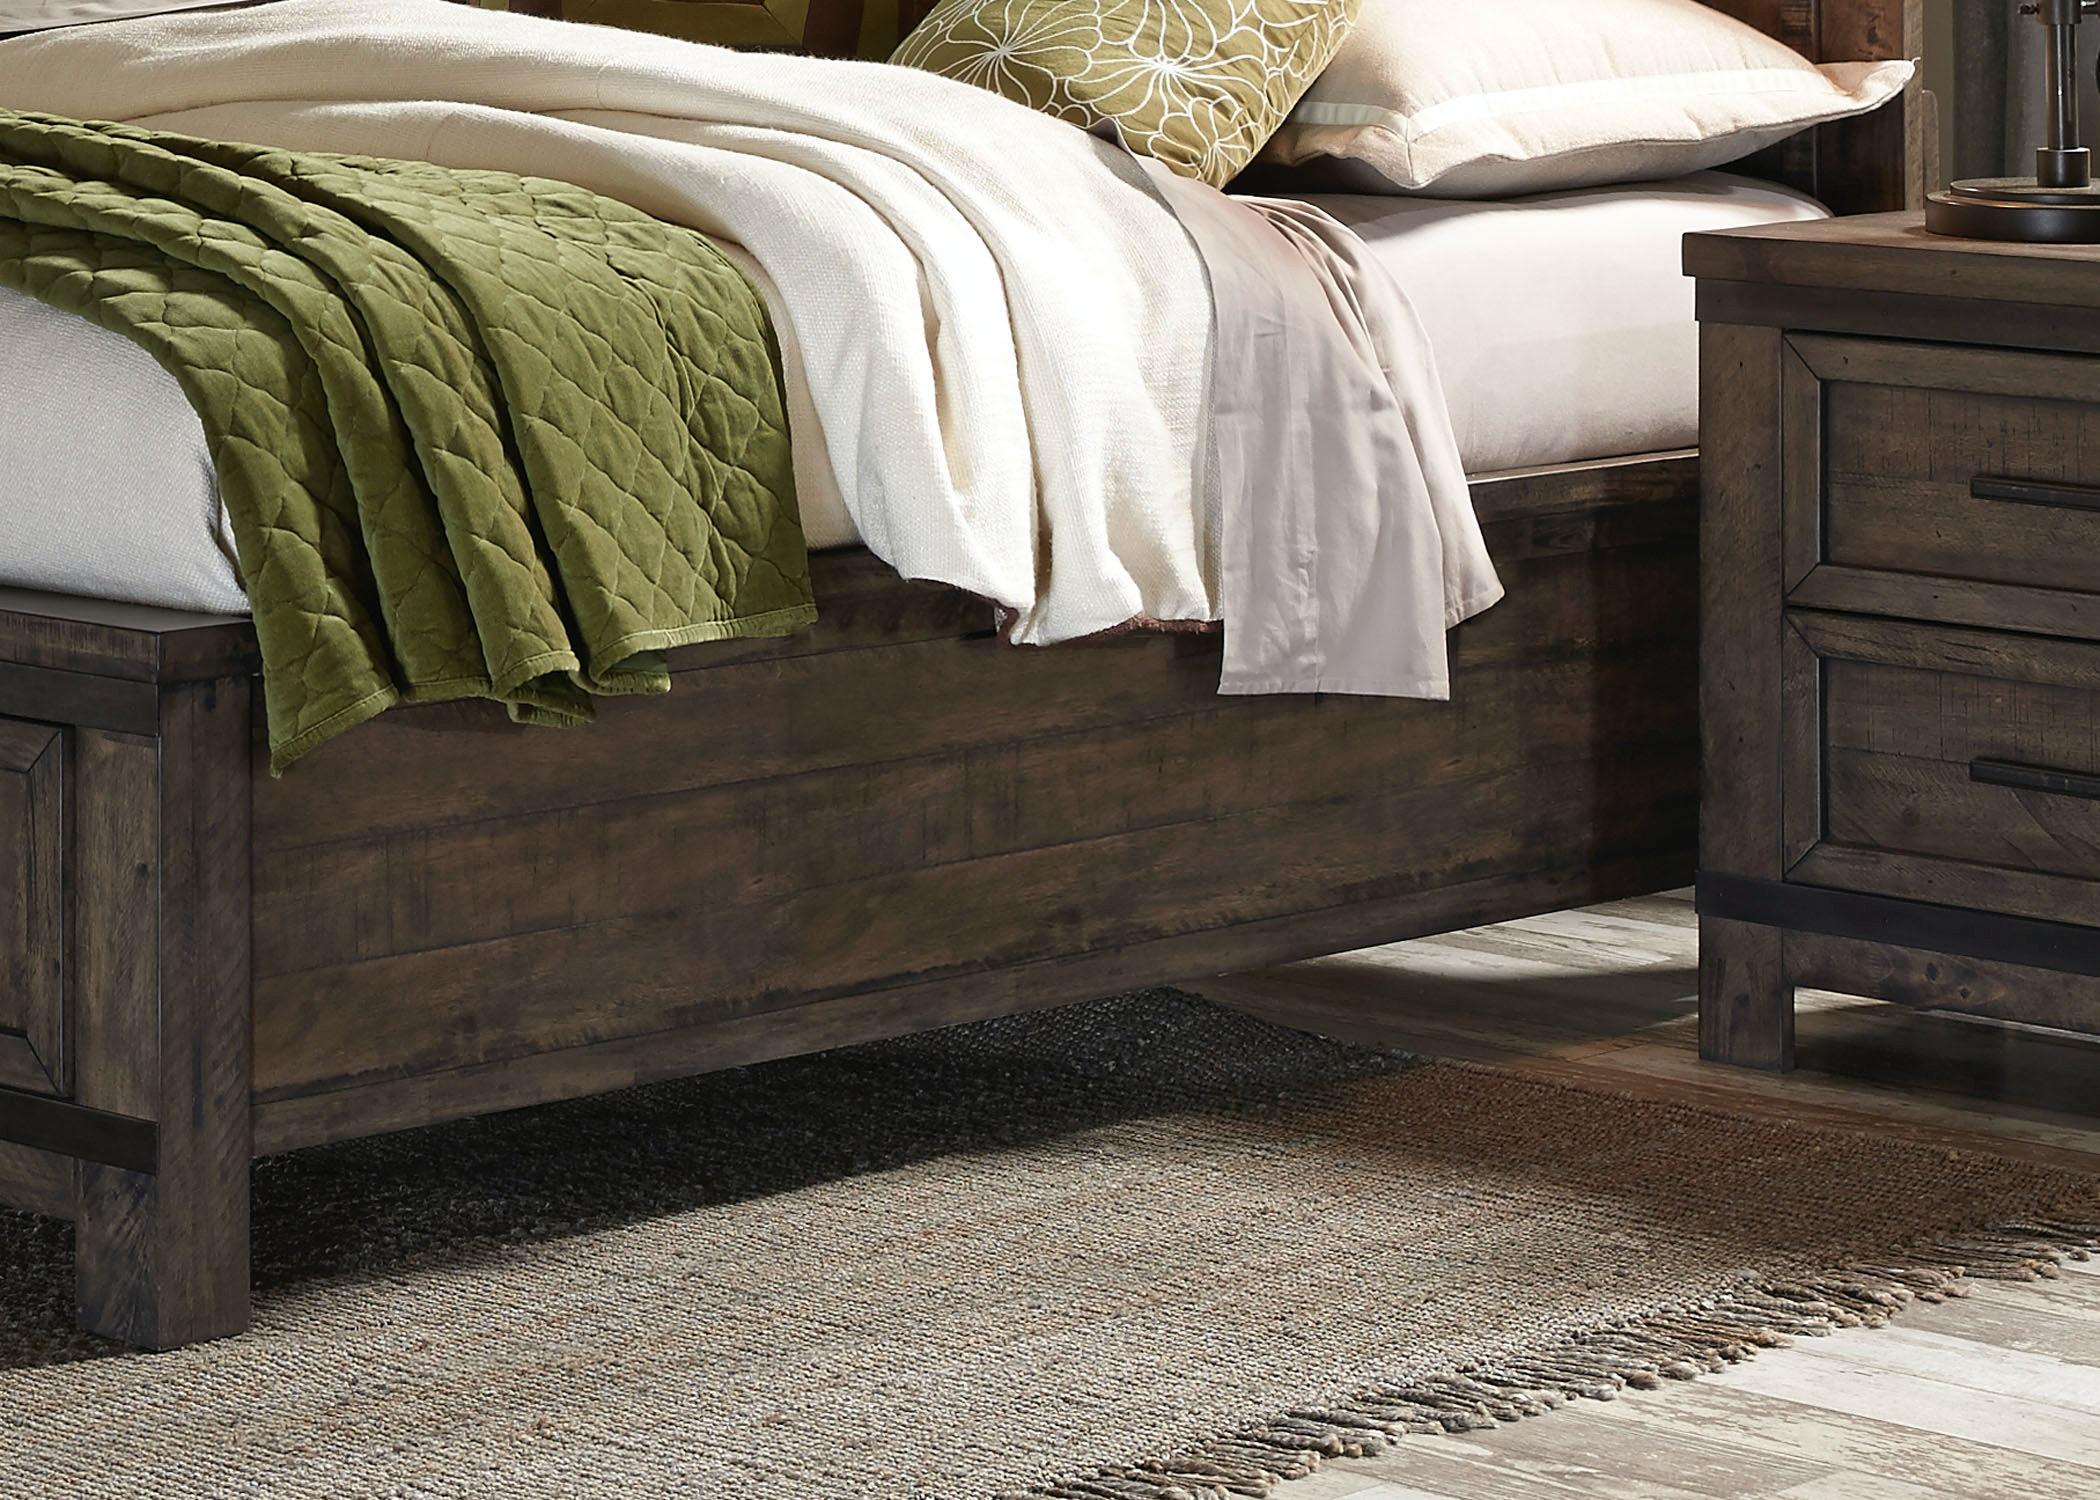 Liberty Furniture Bedroom Storage Bed Rails 759 BR90RSP At Waltman Furniture